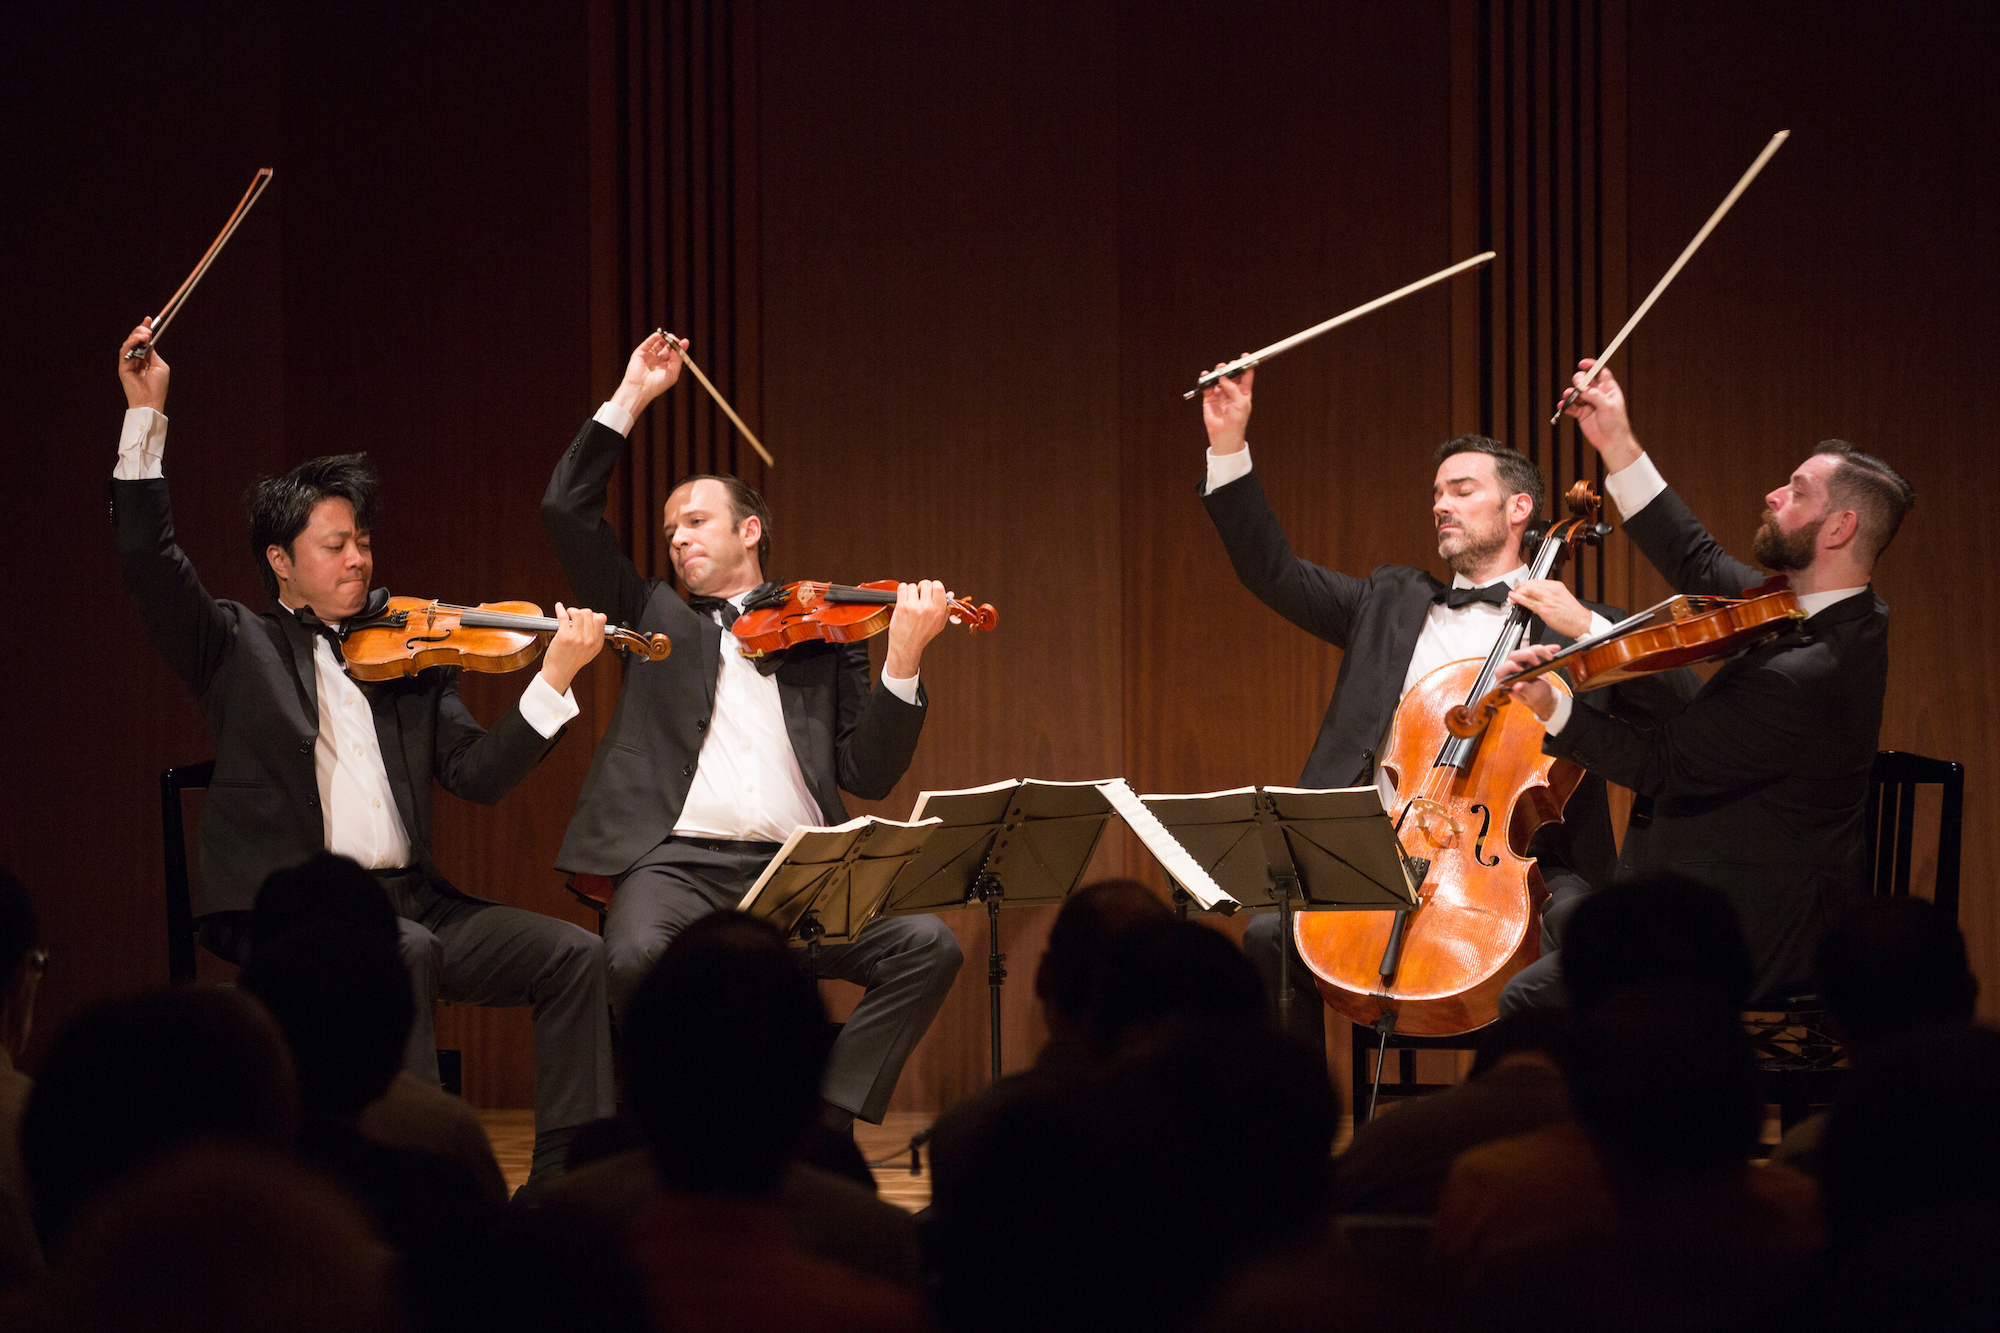 The Miro String Quartet